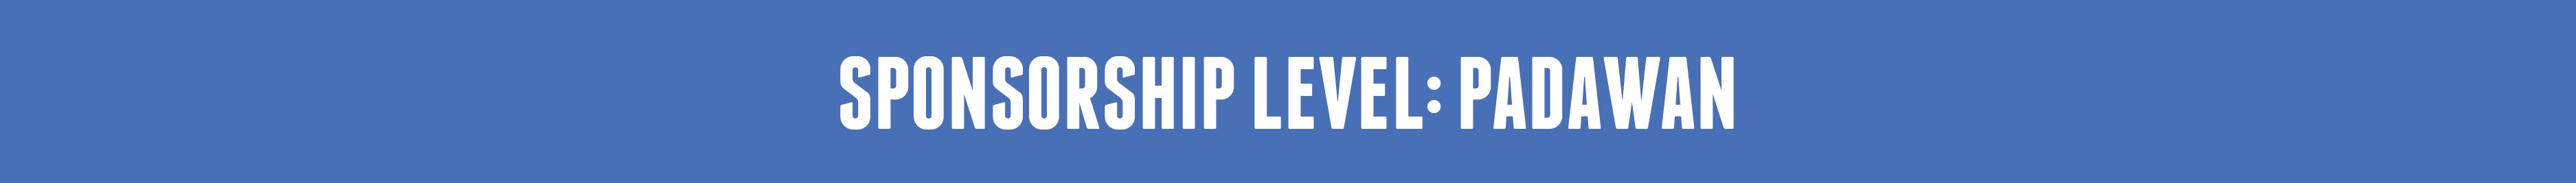 level_padawan